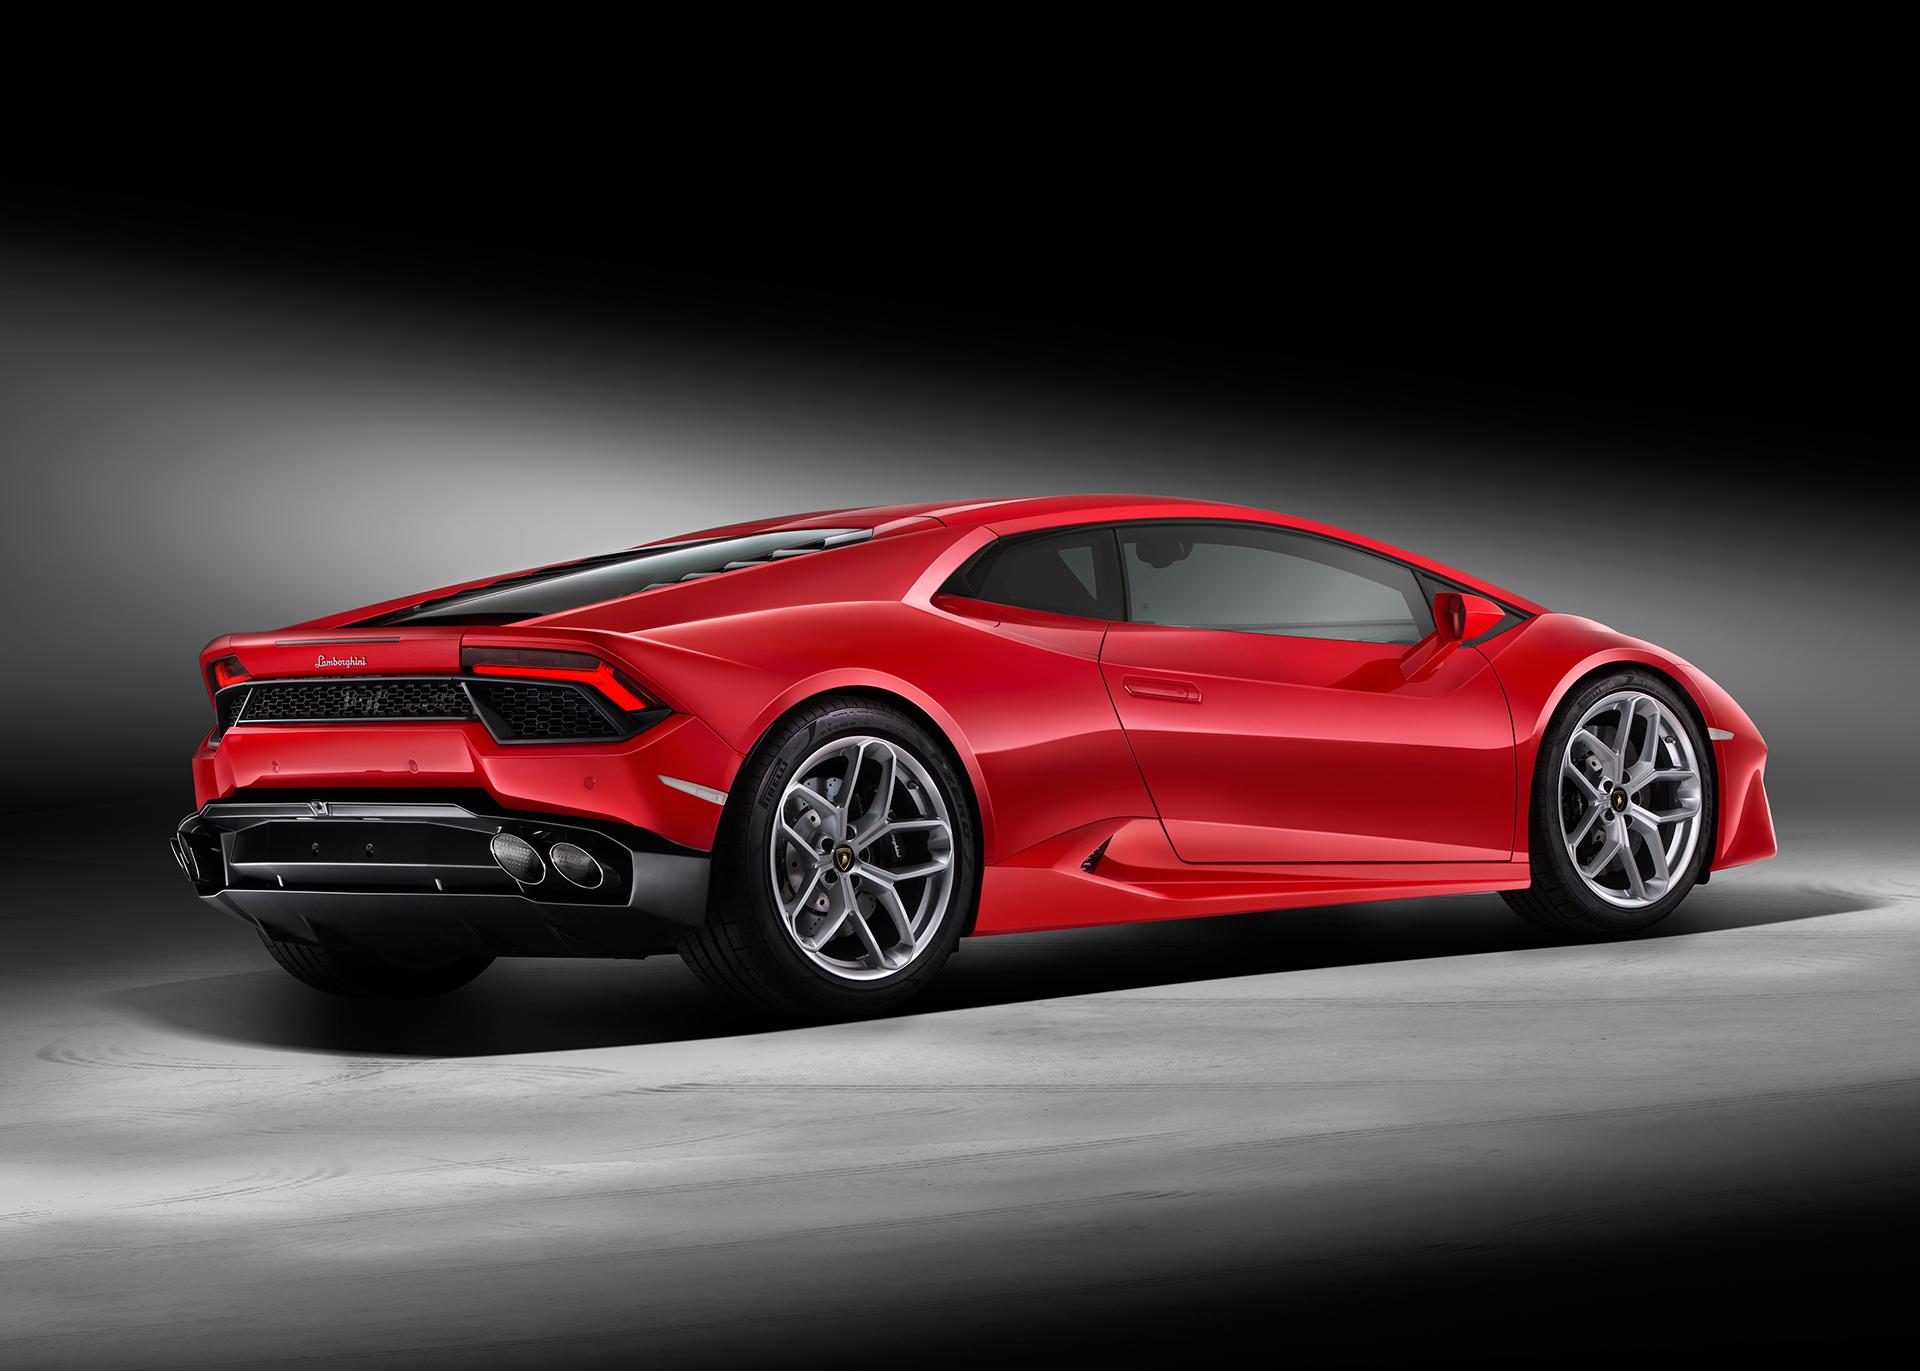 Lamborghini Huracán LP 580-2 - profil arrière / rear side-face